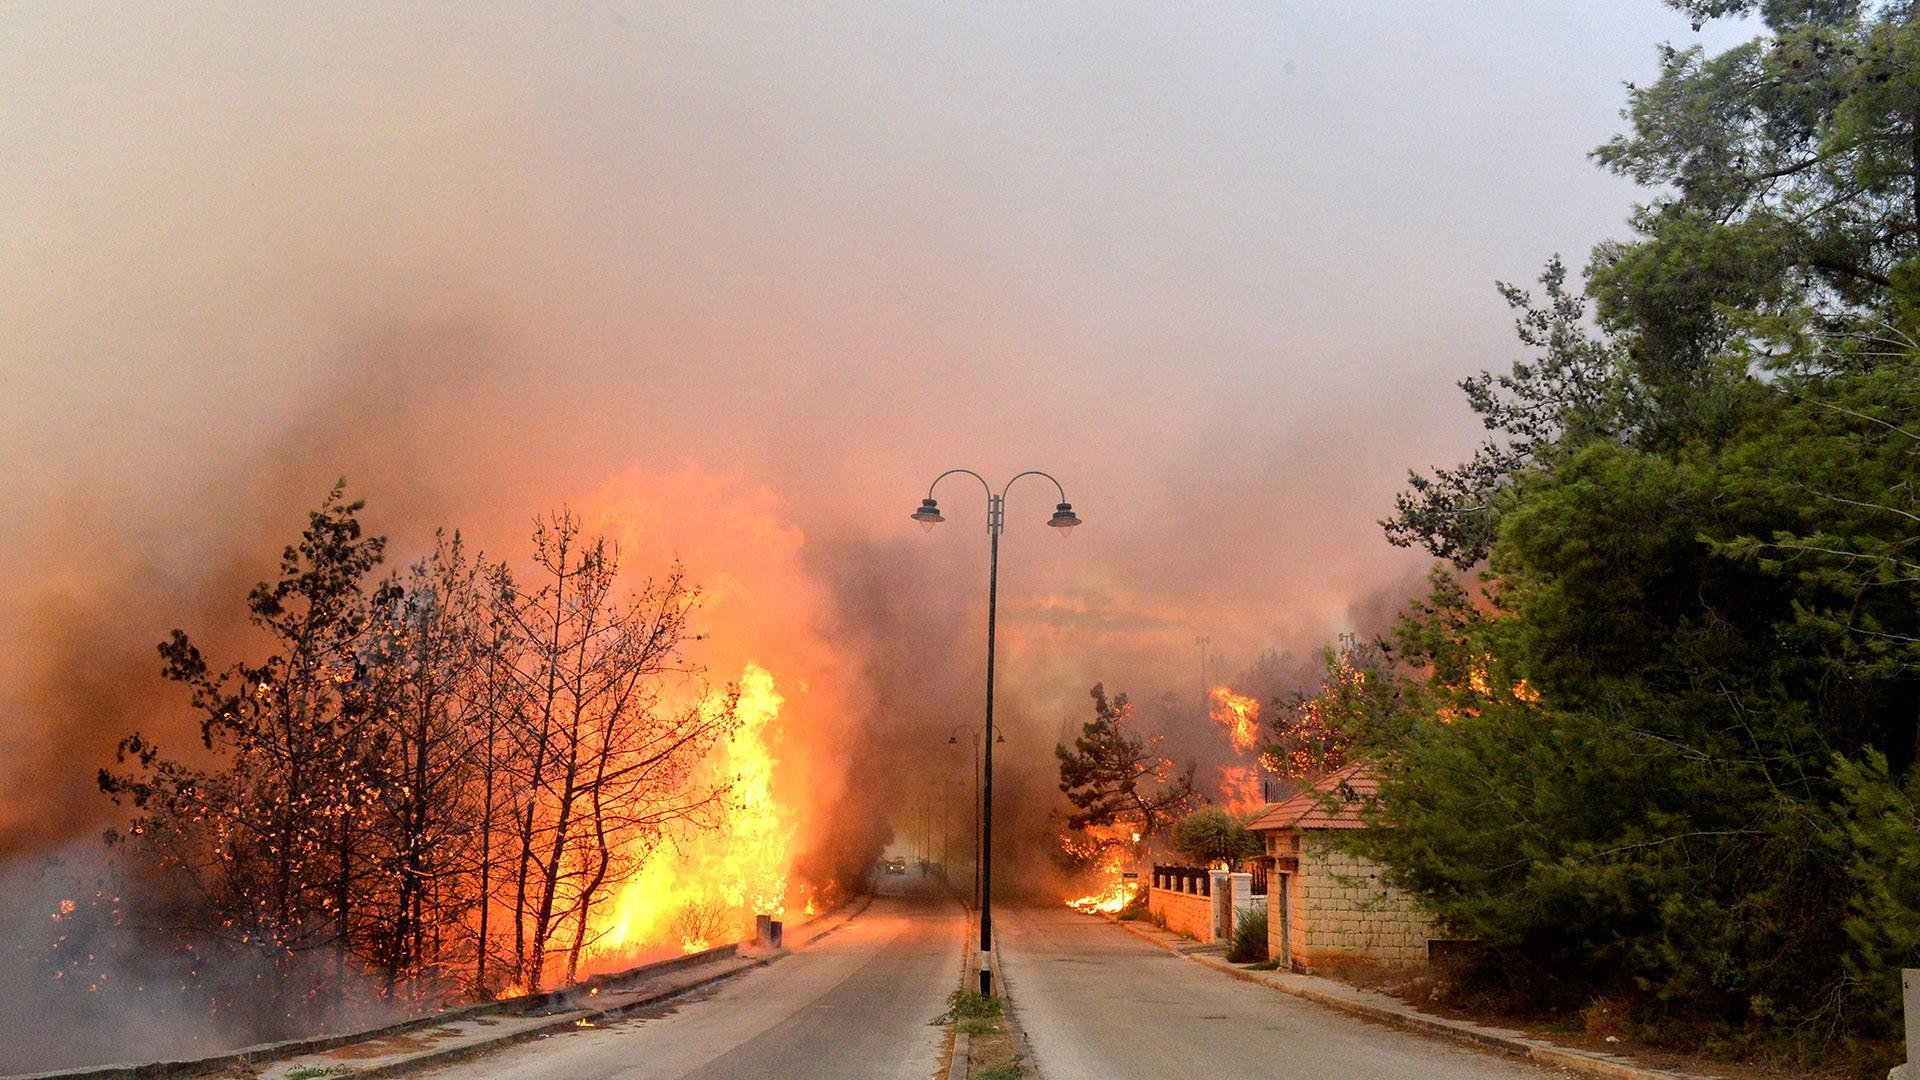 لبنان .. استمرار الحرائق